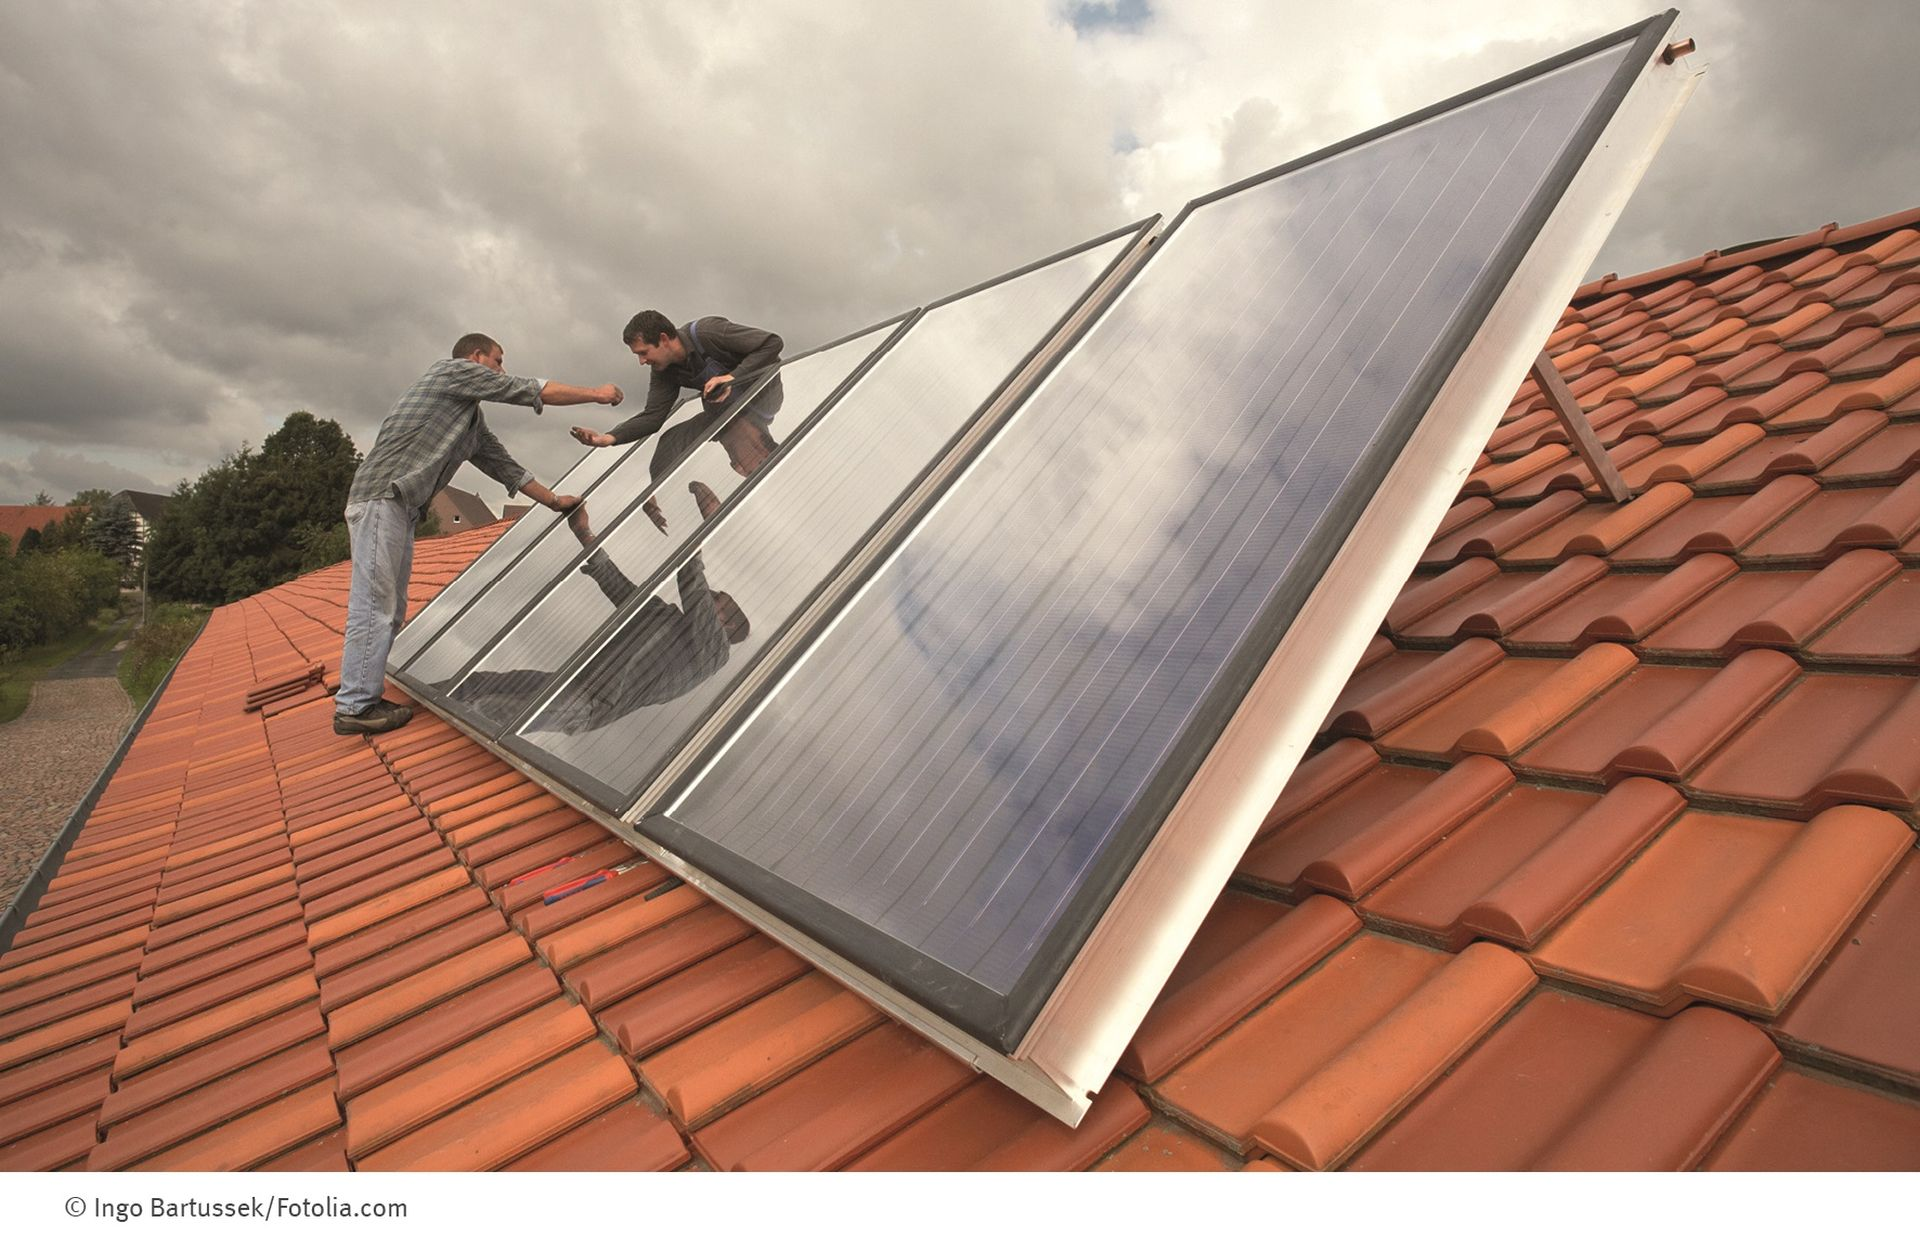 Solarwärme-Check auf einem Dach